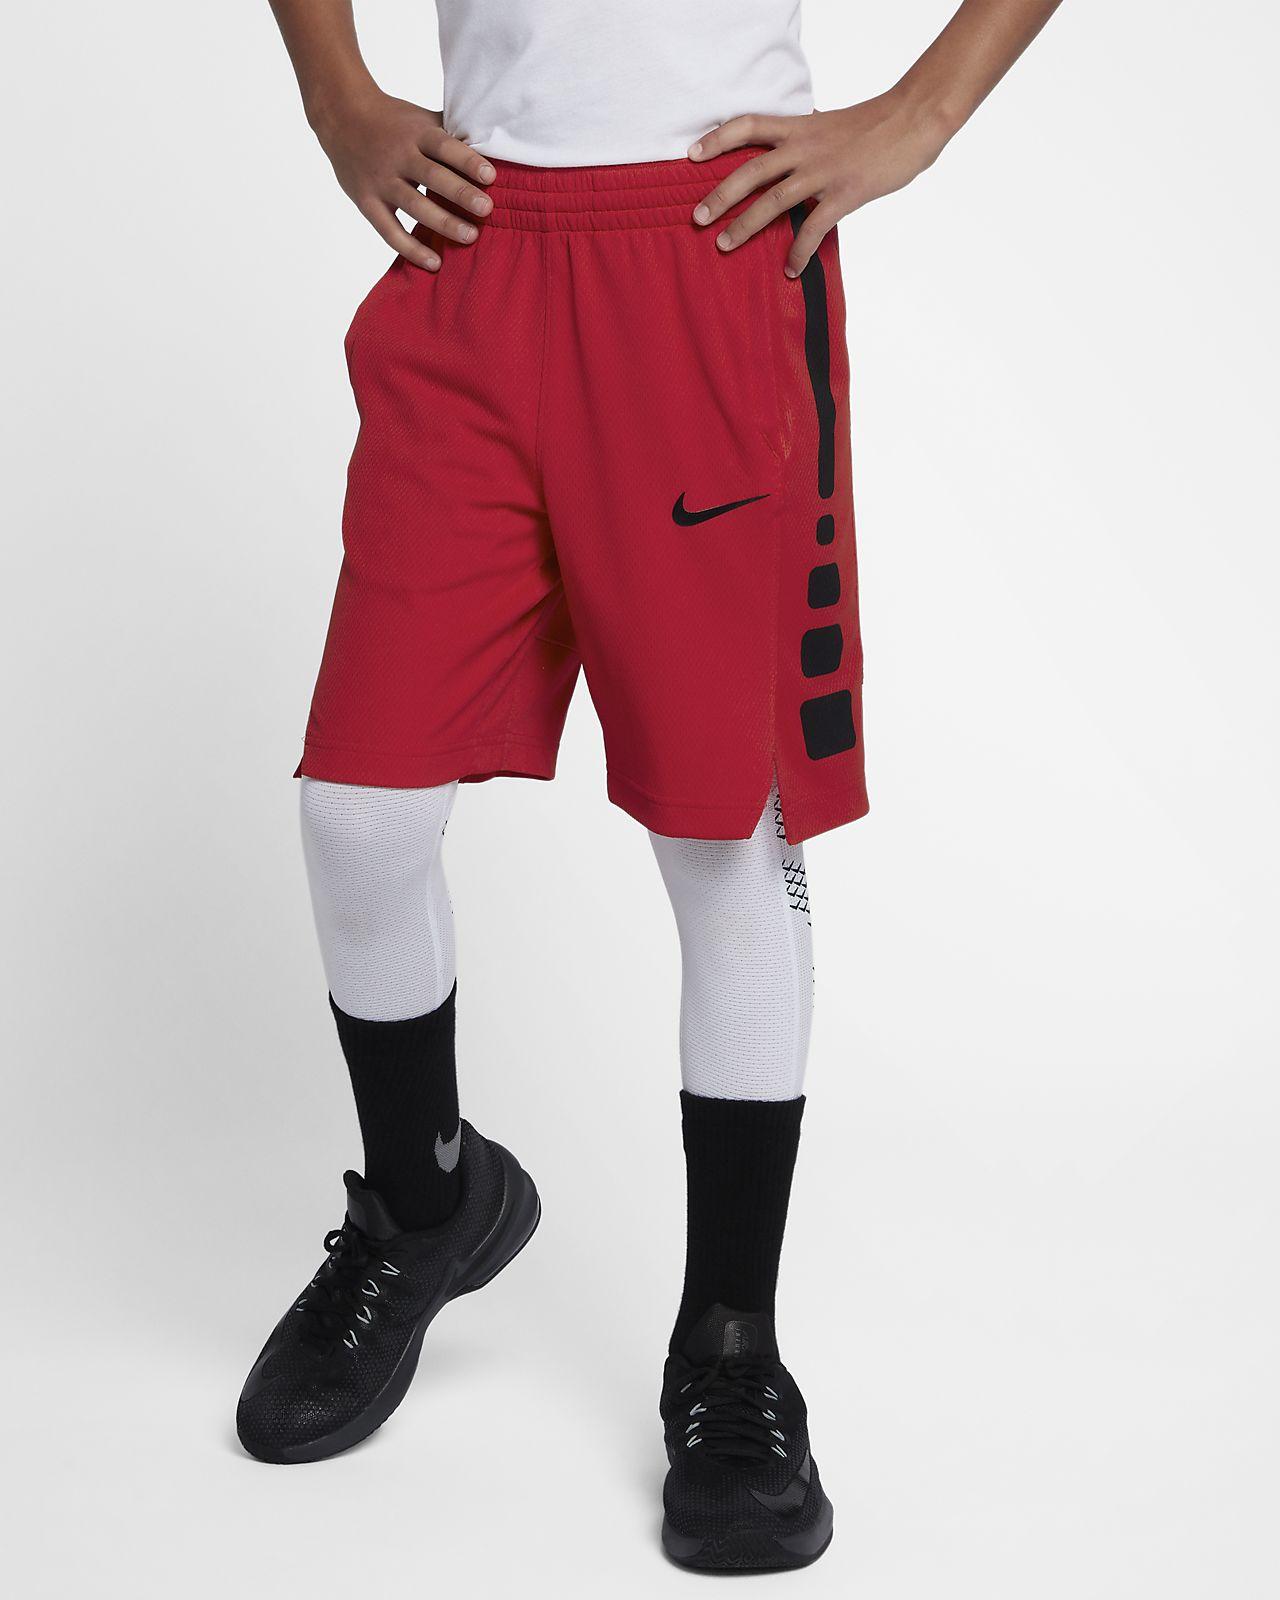 3bfe4464 Nike Dri-FIT Elite Big Kids' (Boys') Basketball Shorts. Nike.com